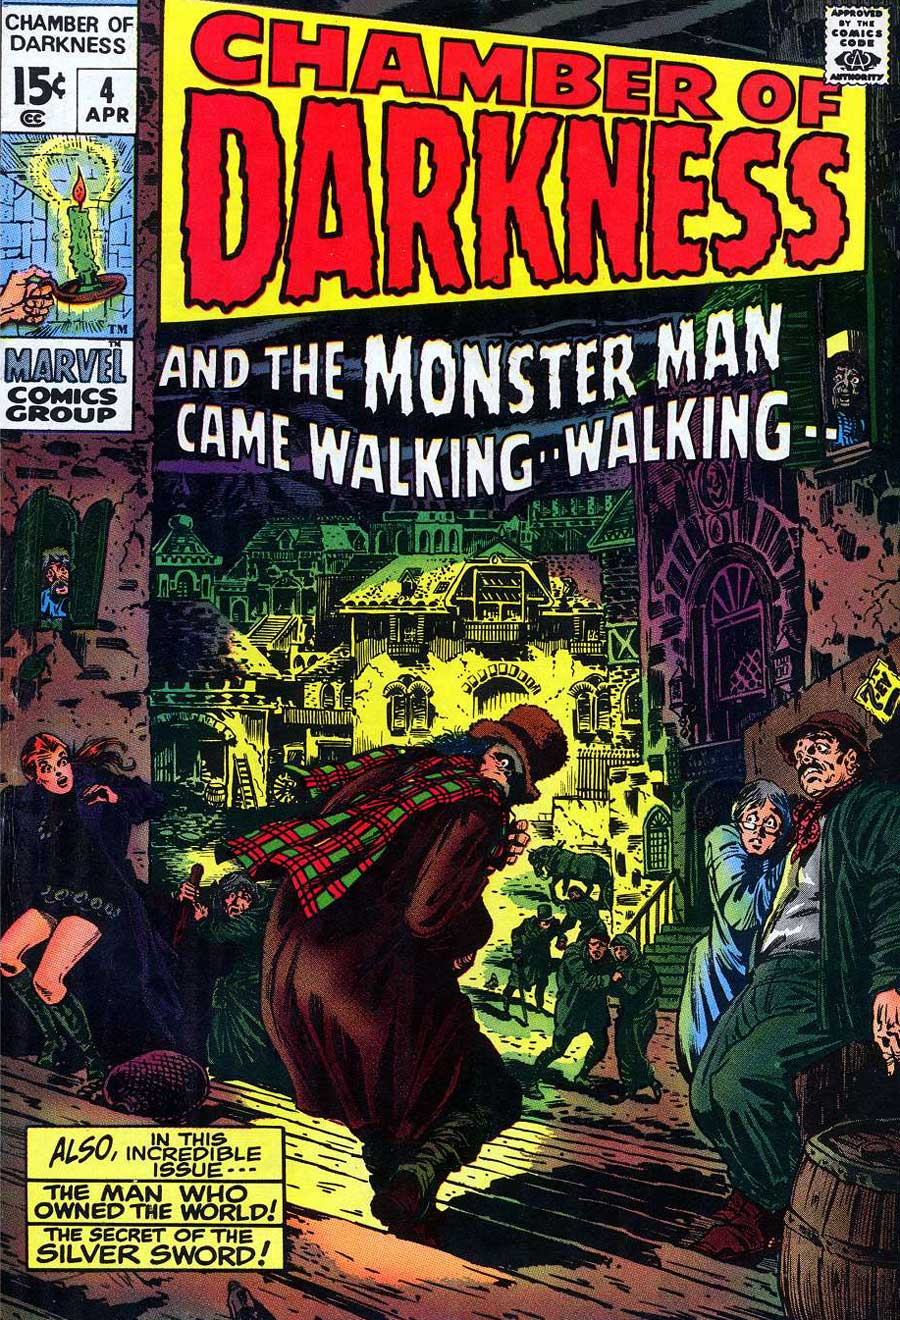 Chamber of Darkness #4